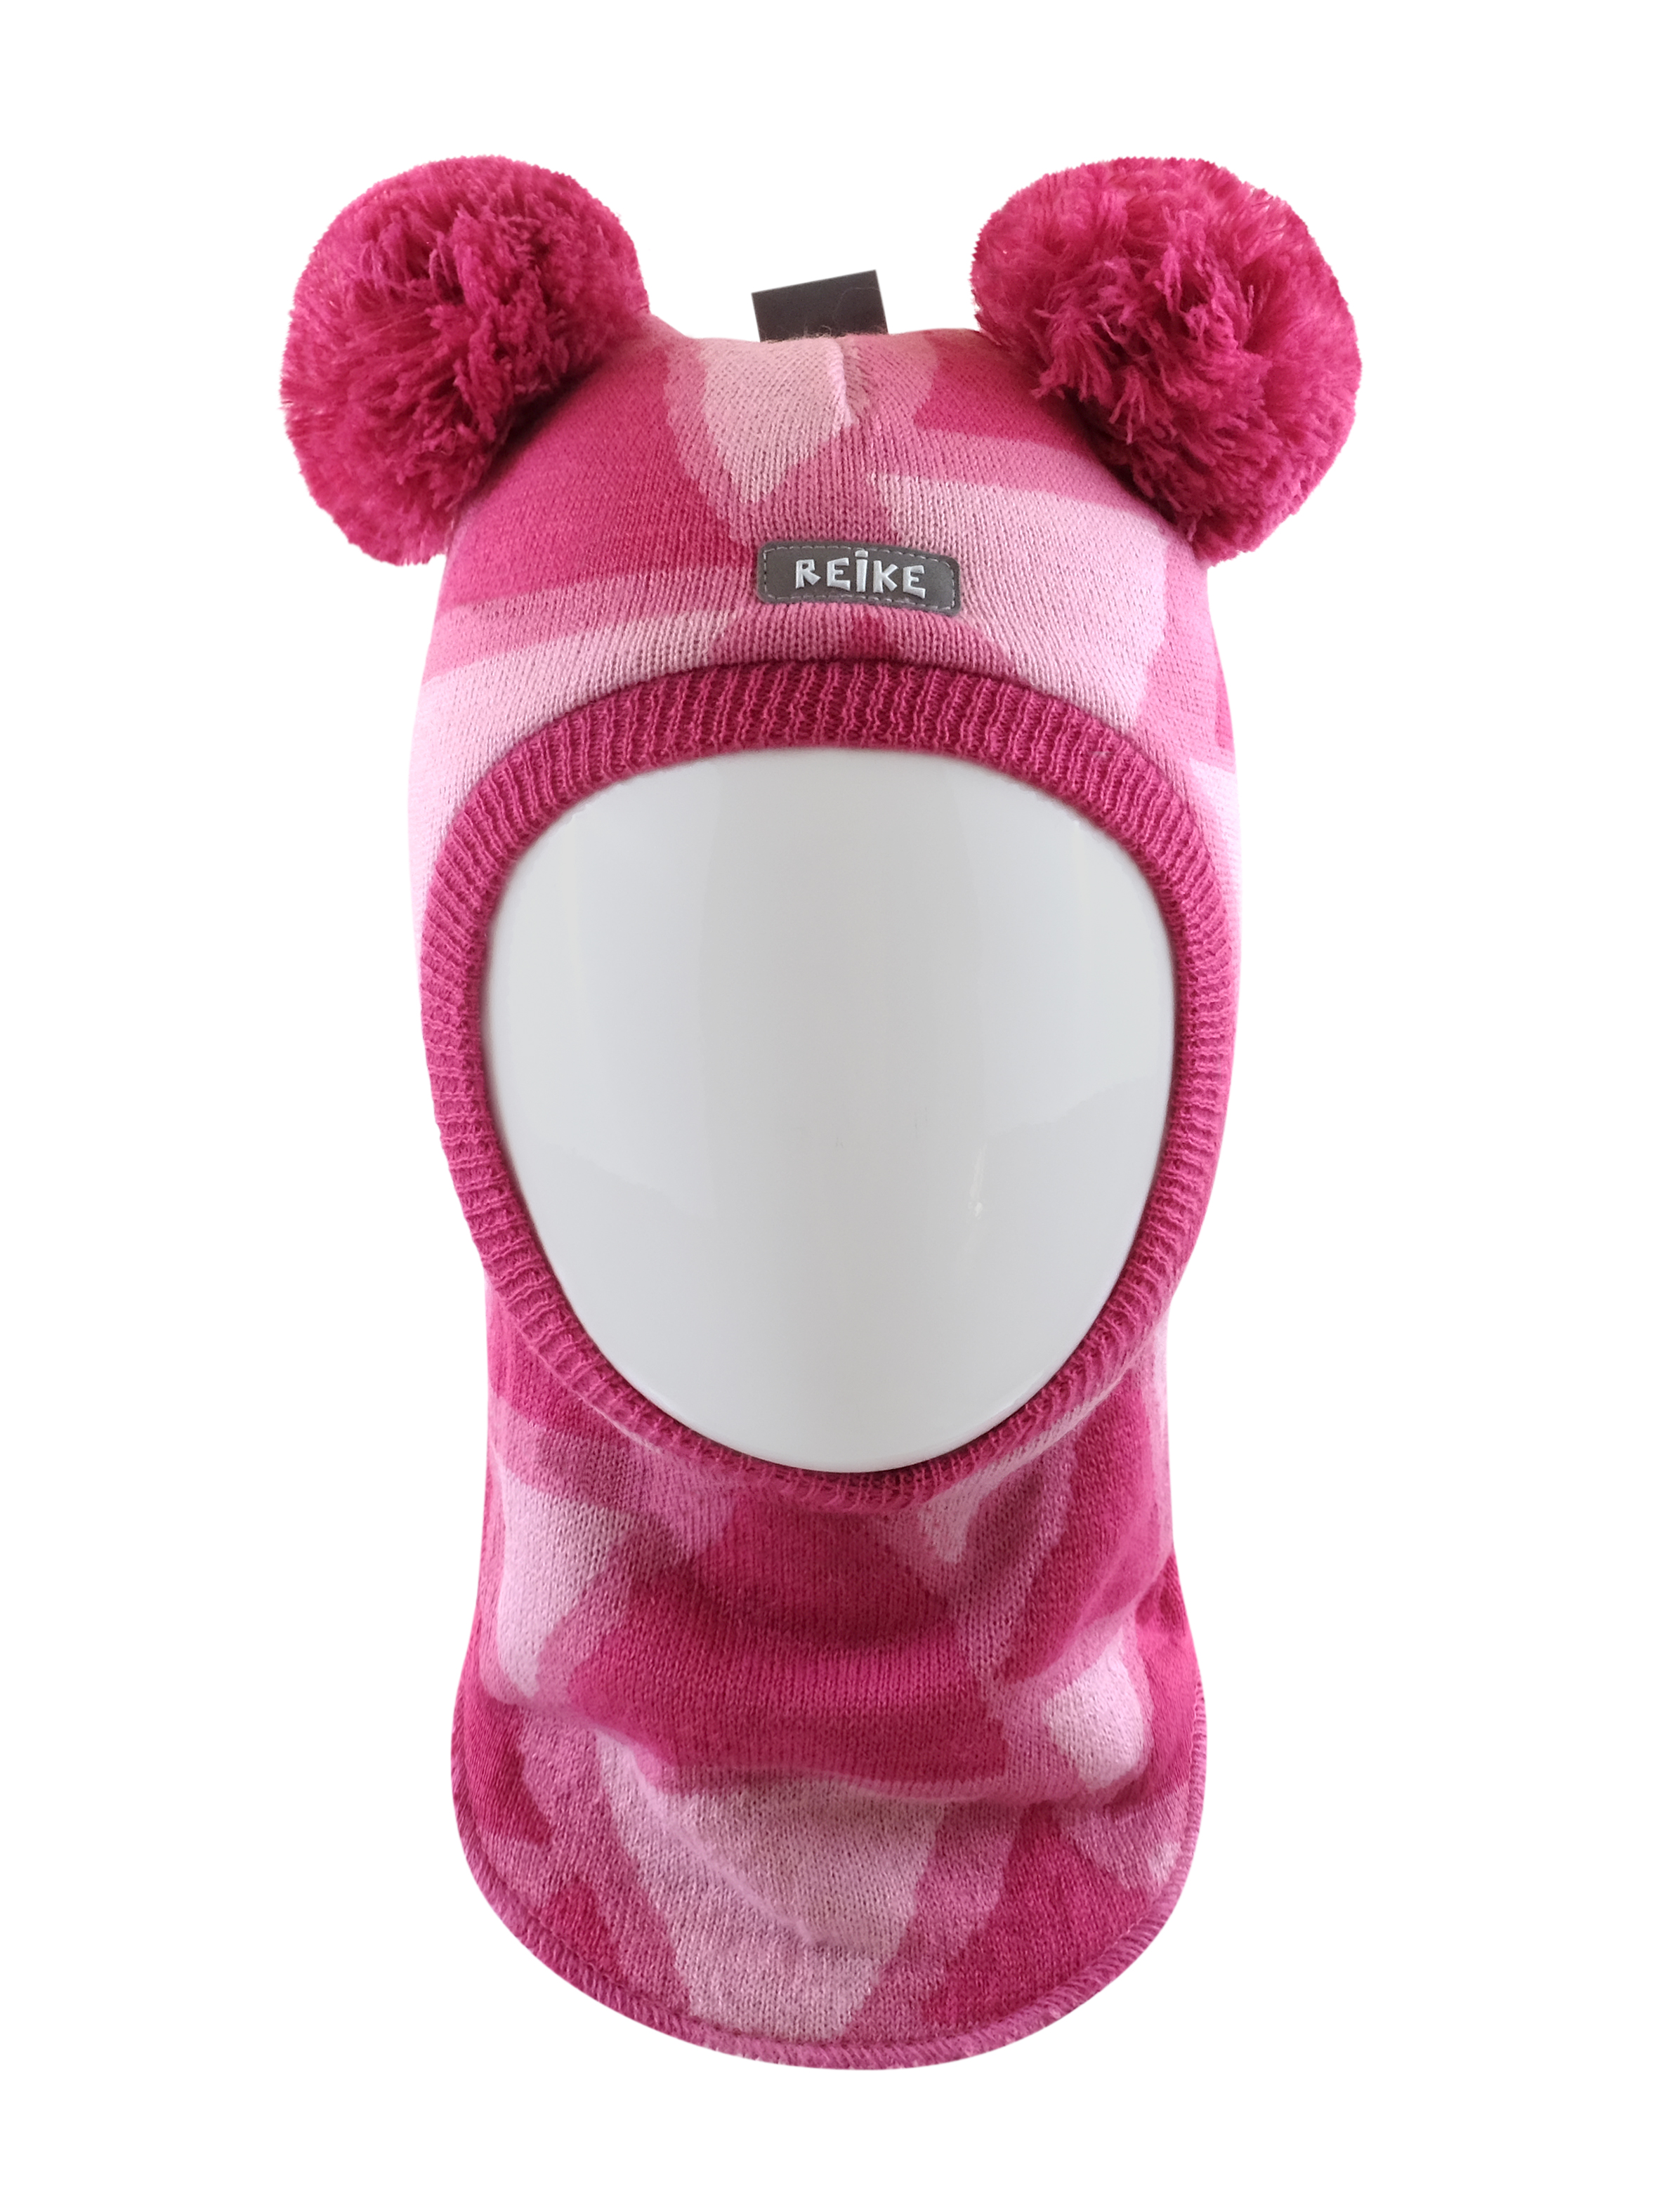 Купить Шапка-шлем для девочки Reike Bunnies fuchsia, RKN2021-1 BNS fuchsia, р.48,